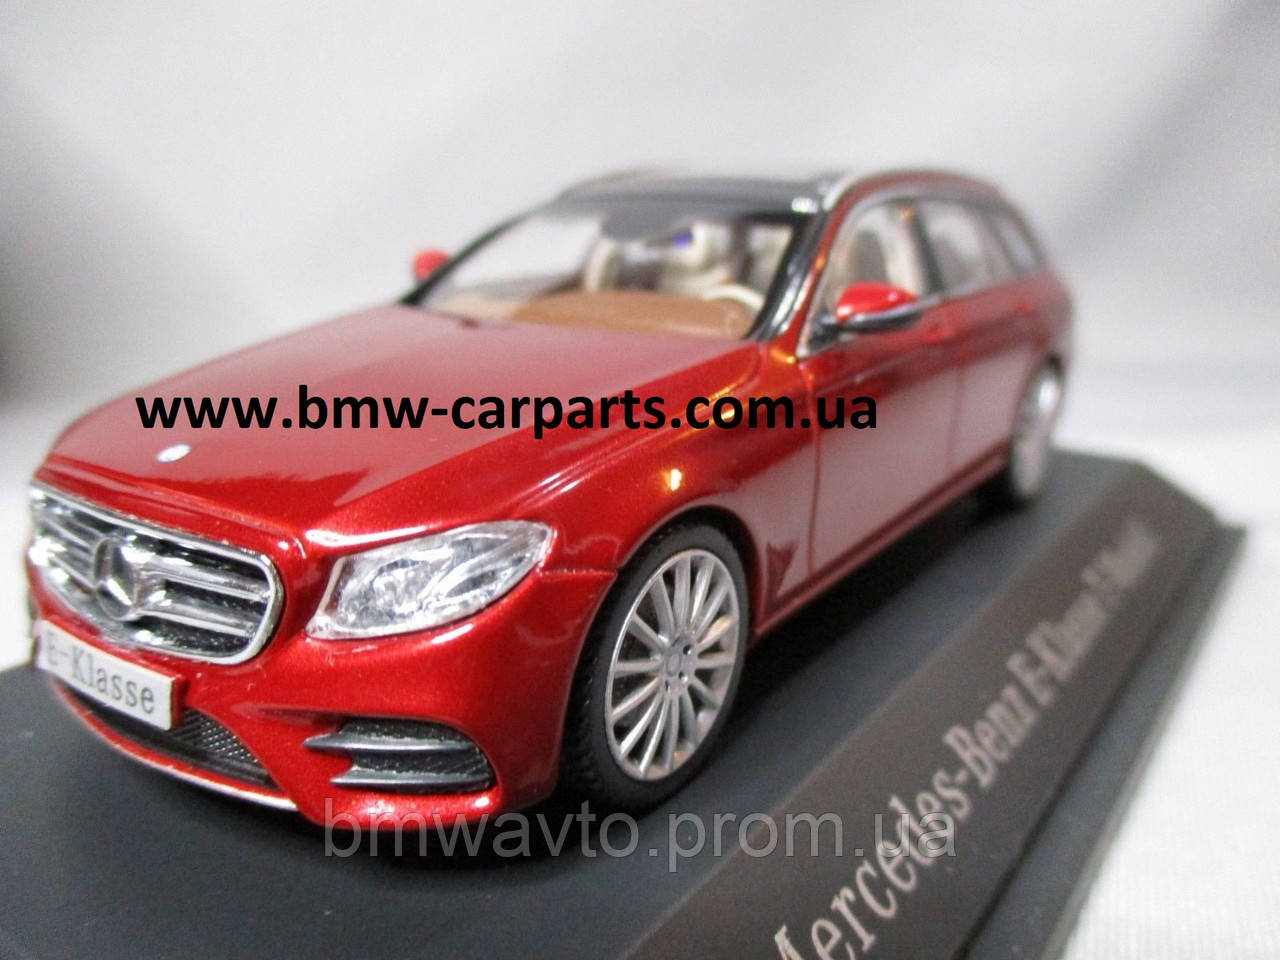 Модель Mercedes-Benz E-Class Estate, AMG Line, Designo Hyacinth Red Metallic, Scale 1:43